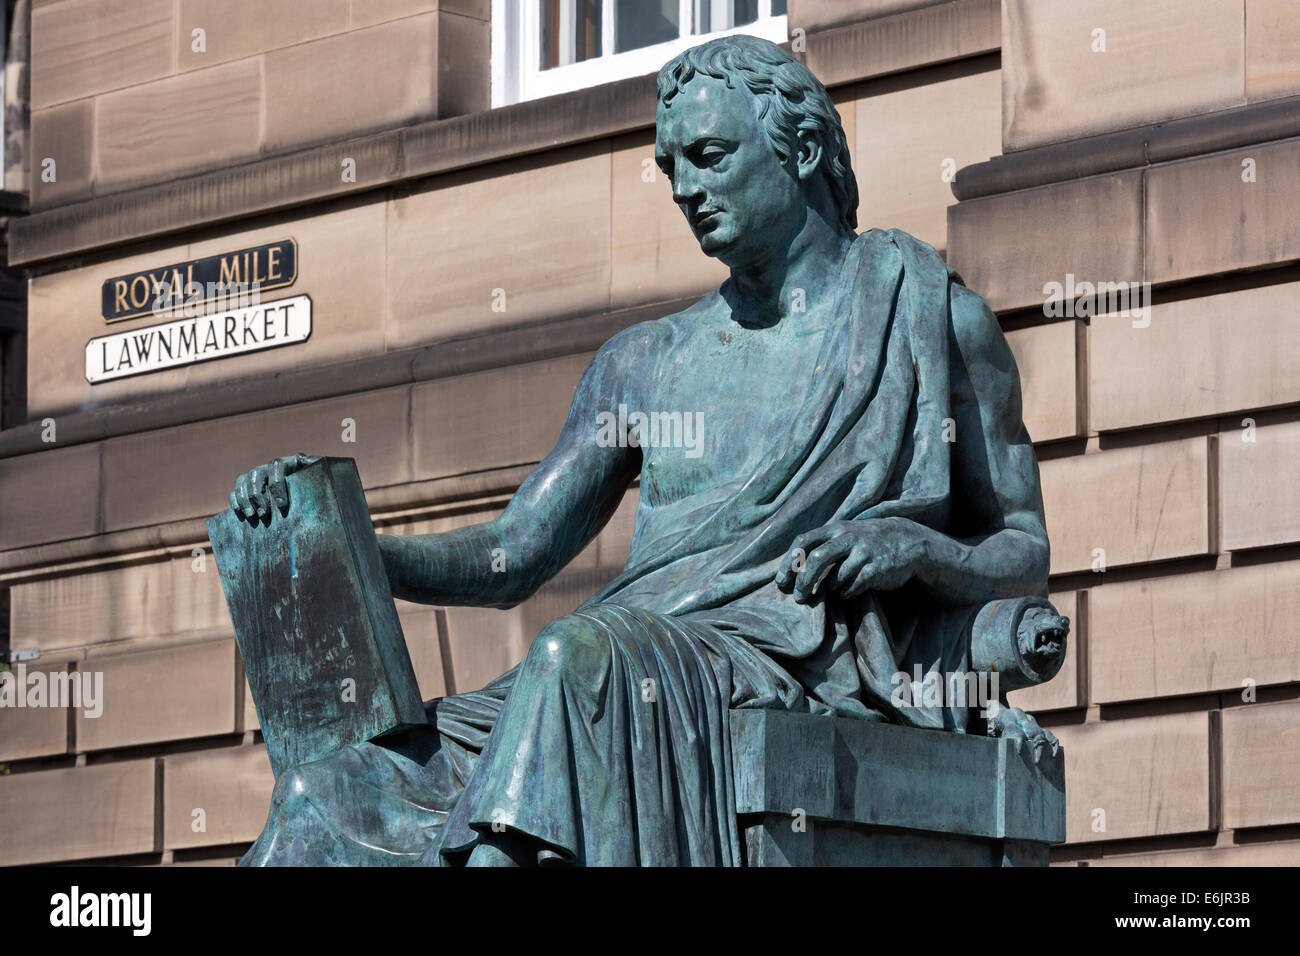 Statue of David Hume, Scottish philosopher, born 1711, died 1776, in the Royal Mile, Edinburgh, Scotland, UK - Stock Image